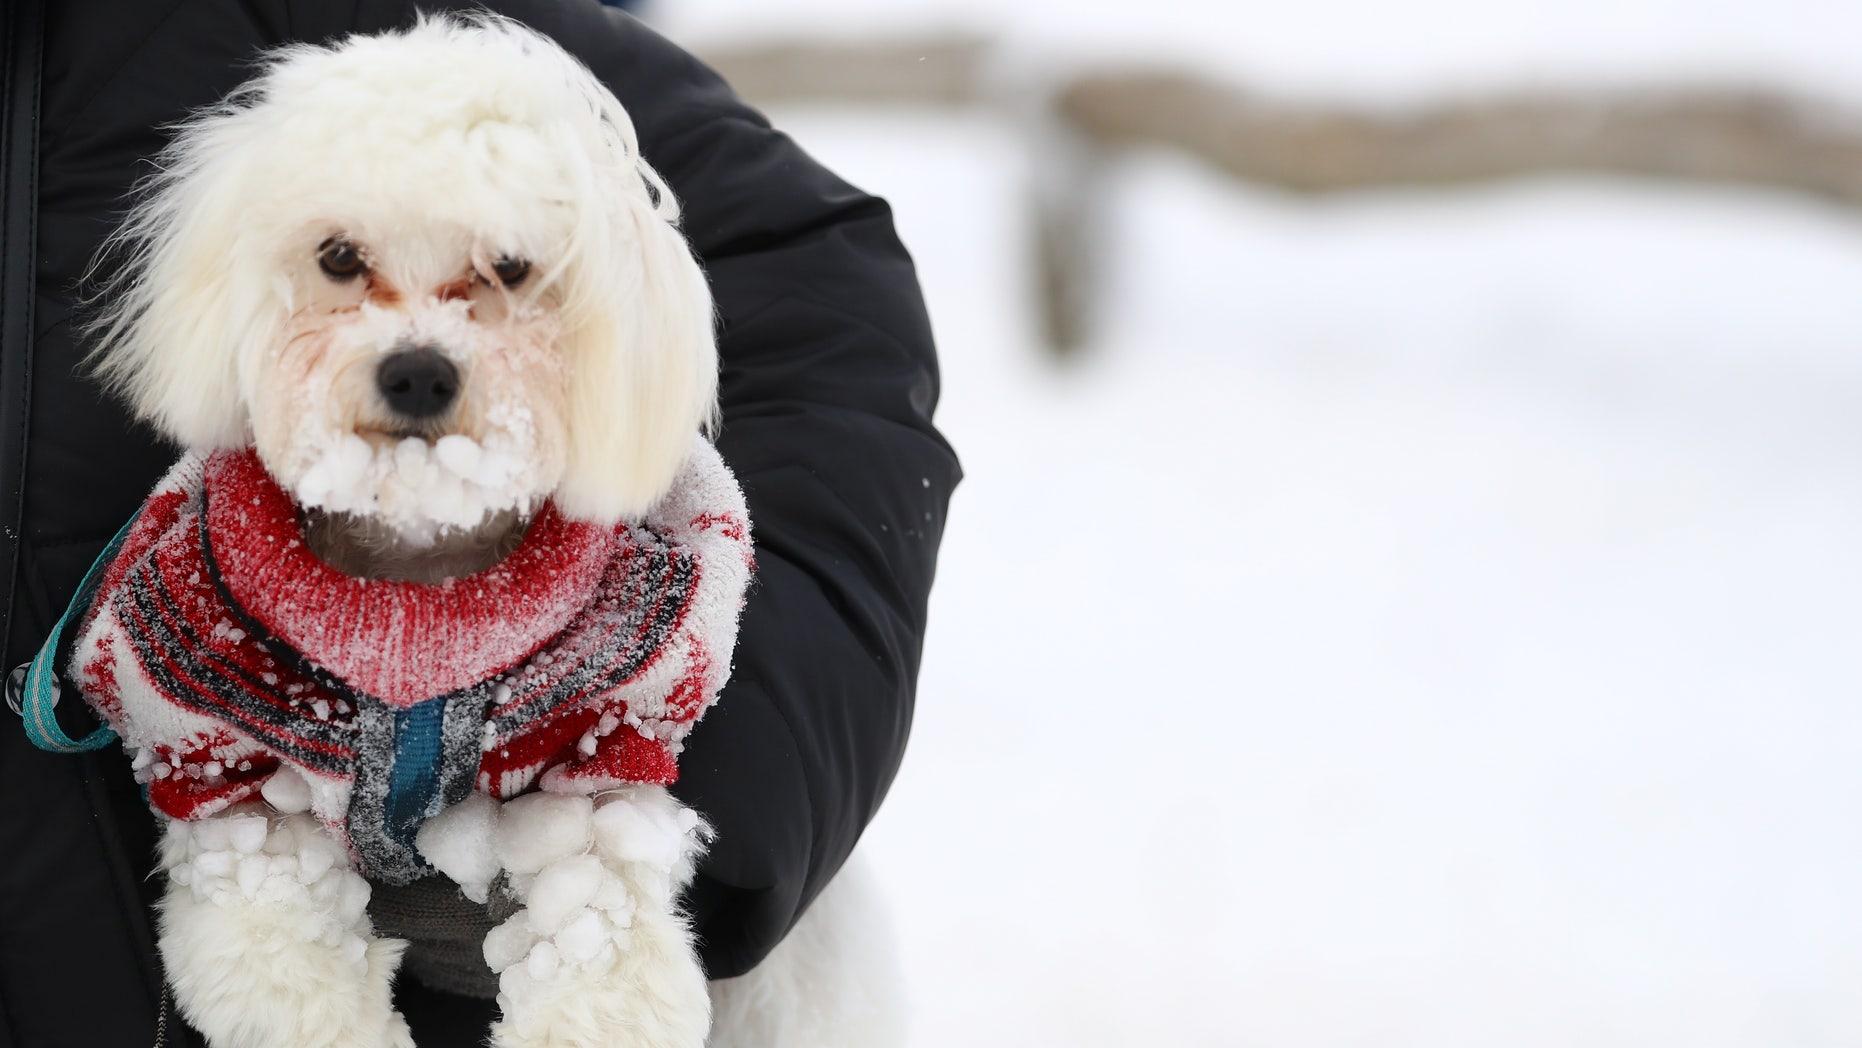 A dog is covered with snow at Feldberg mountain near Frankfurt, Germany, January 5, 2017. (REUTERS/Kai Pfaffenbach)